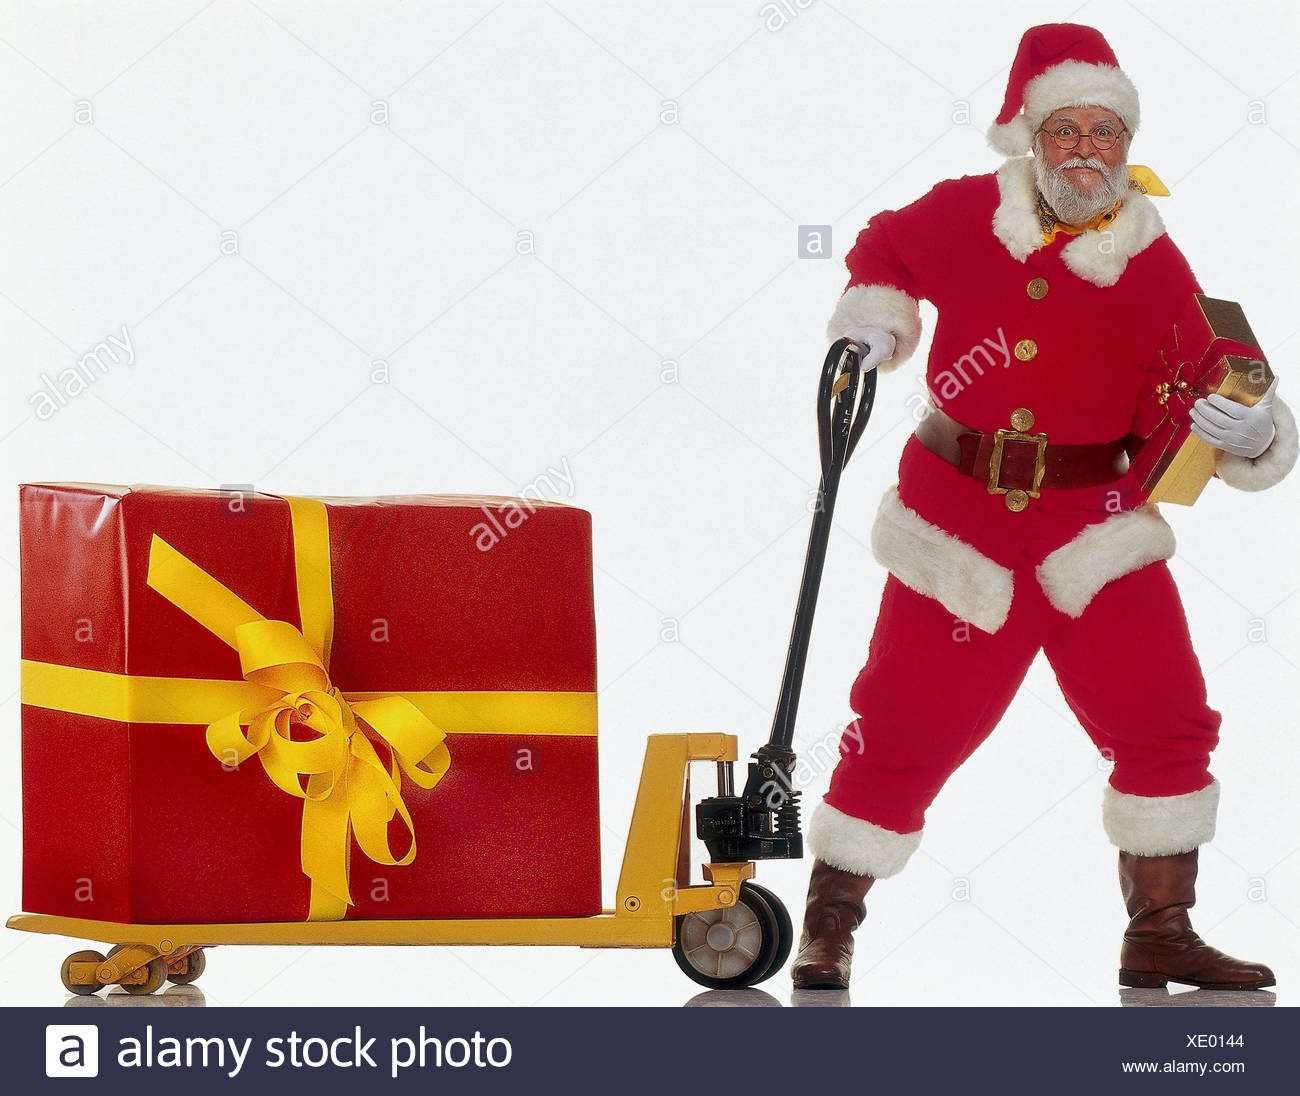 Santa Claus, elevating platform truck, package, present, drag X-mas, Christmas, Santa, glasses, smile, Christmas present, Christmas presents, present, Christmas package, package, carry, deliver, delivery, deliver, distribute, distribute, studio, cut outs - Stock Image